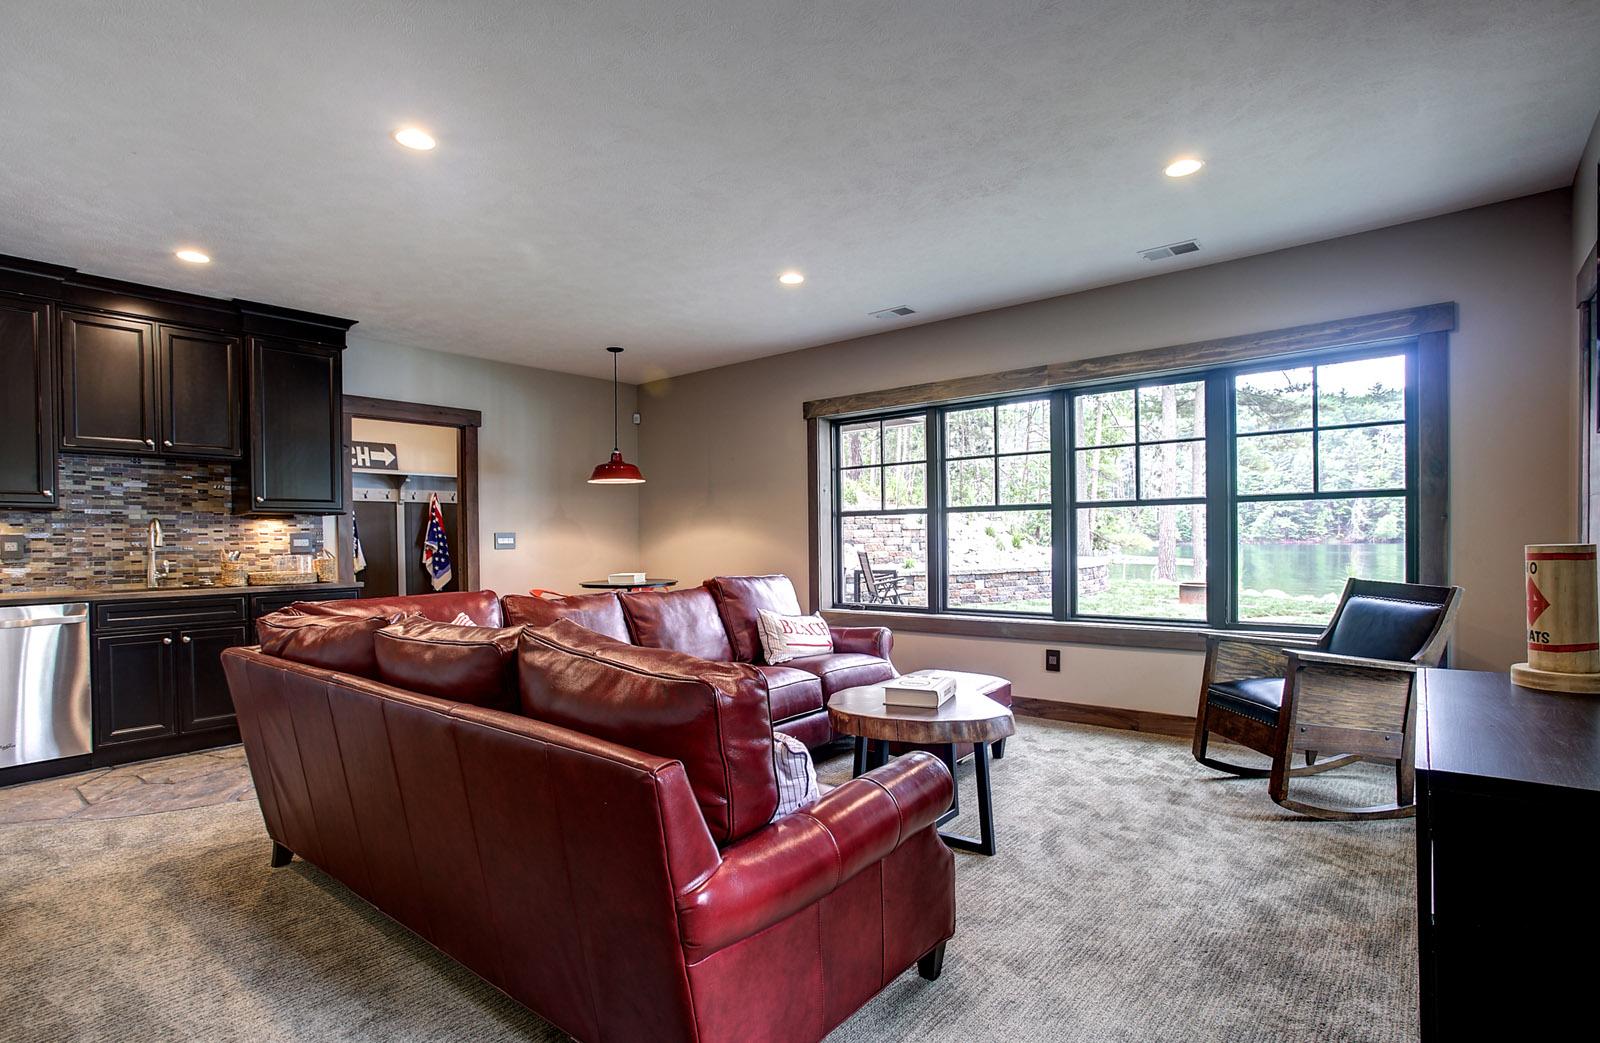 Lakemore Retreat Lodge Bac Design Group